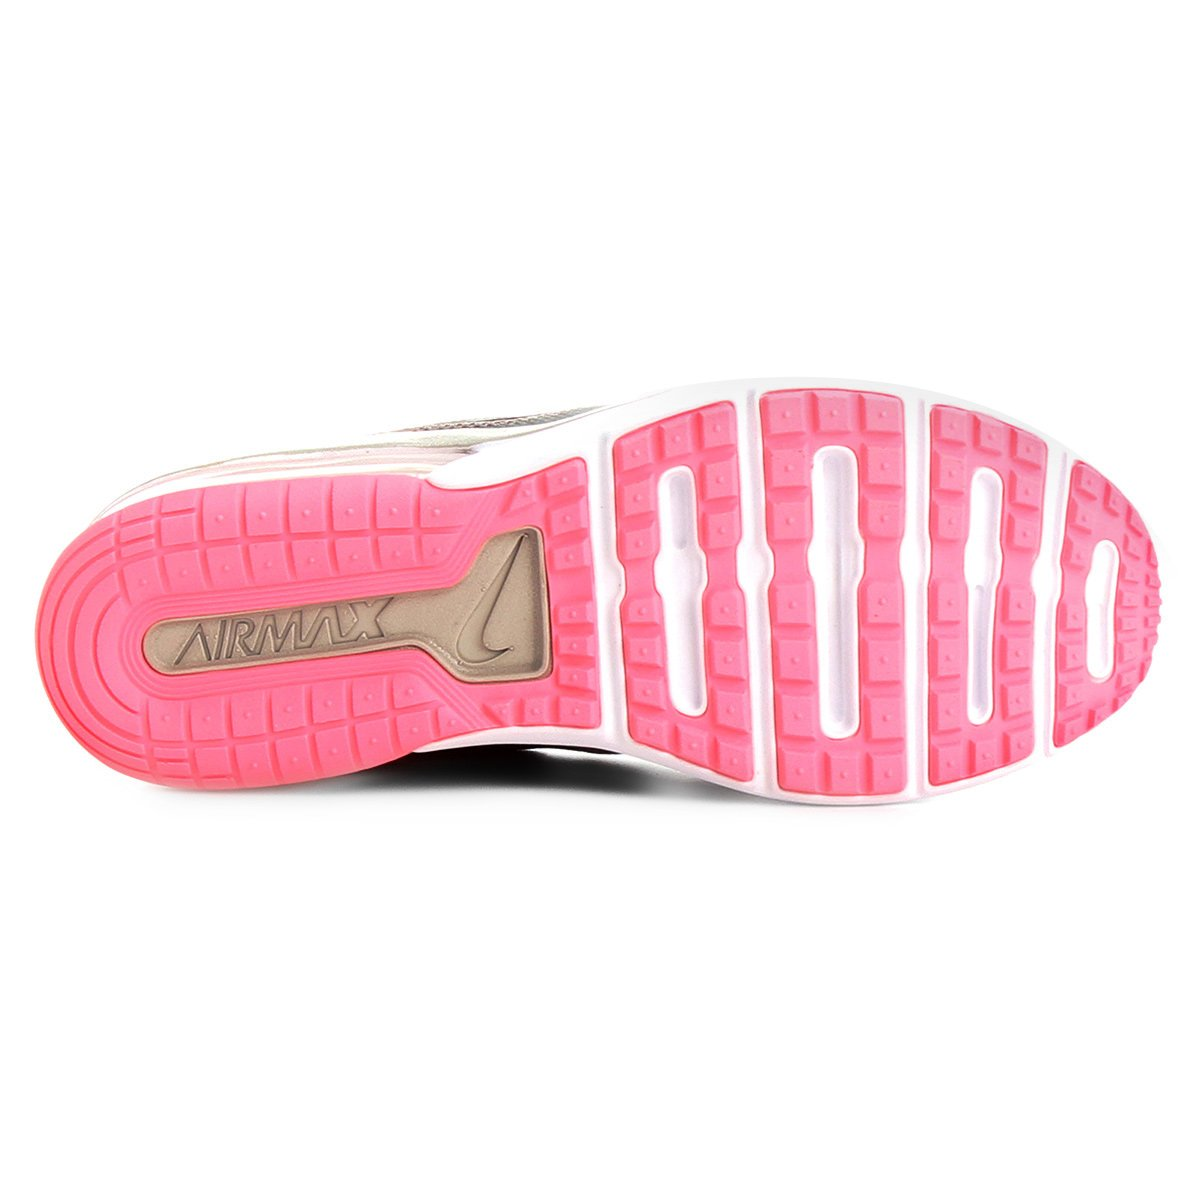 e Feminino Tênis Fury Max Nike Off Coral Air white 7qq01wpx